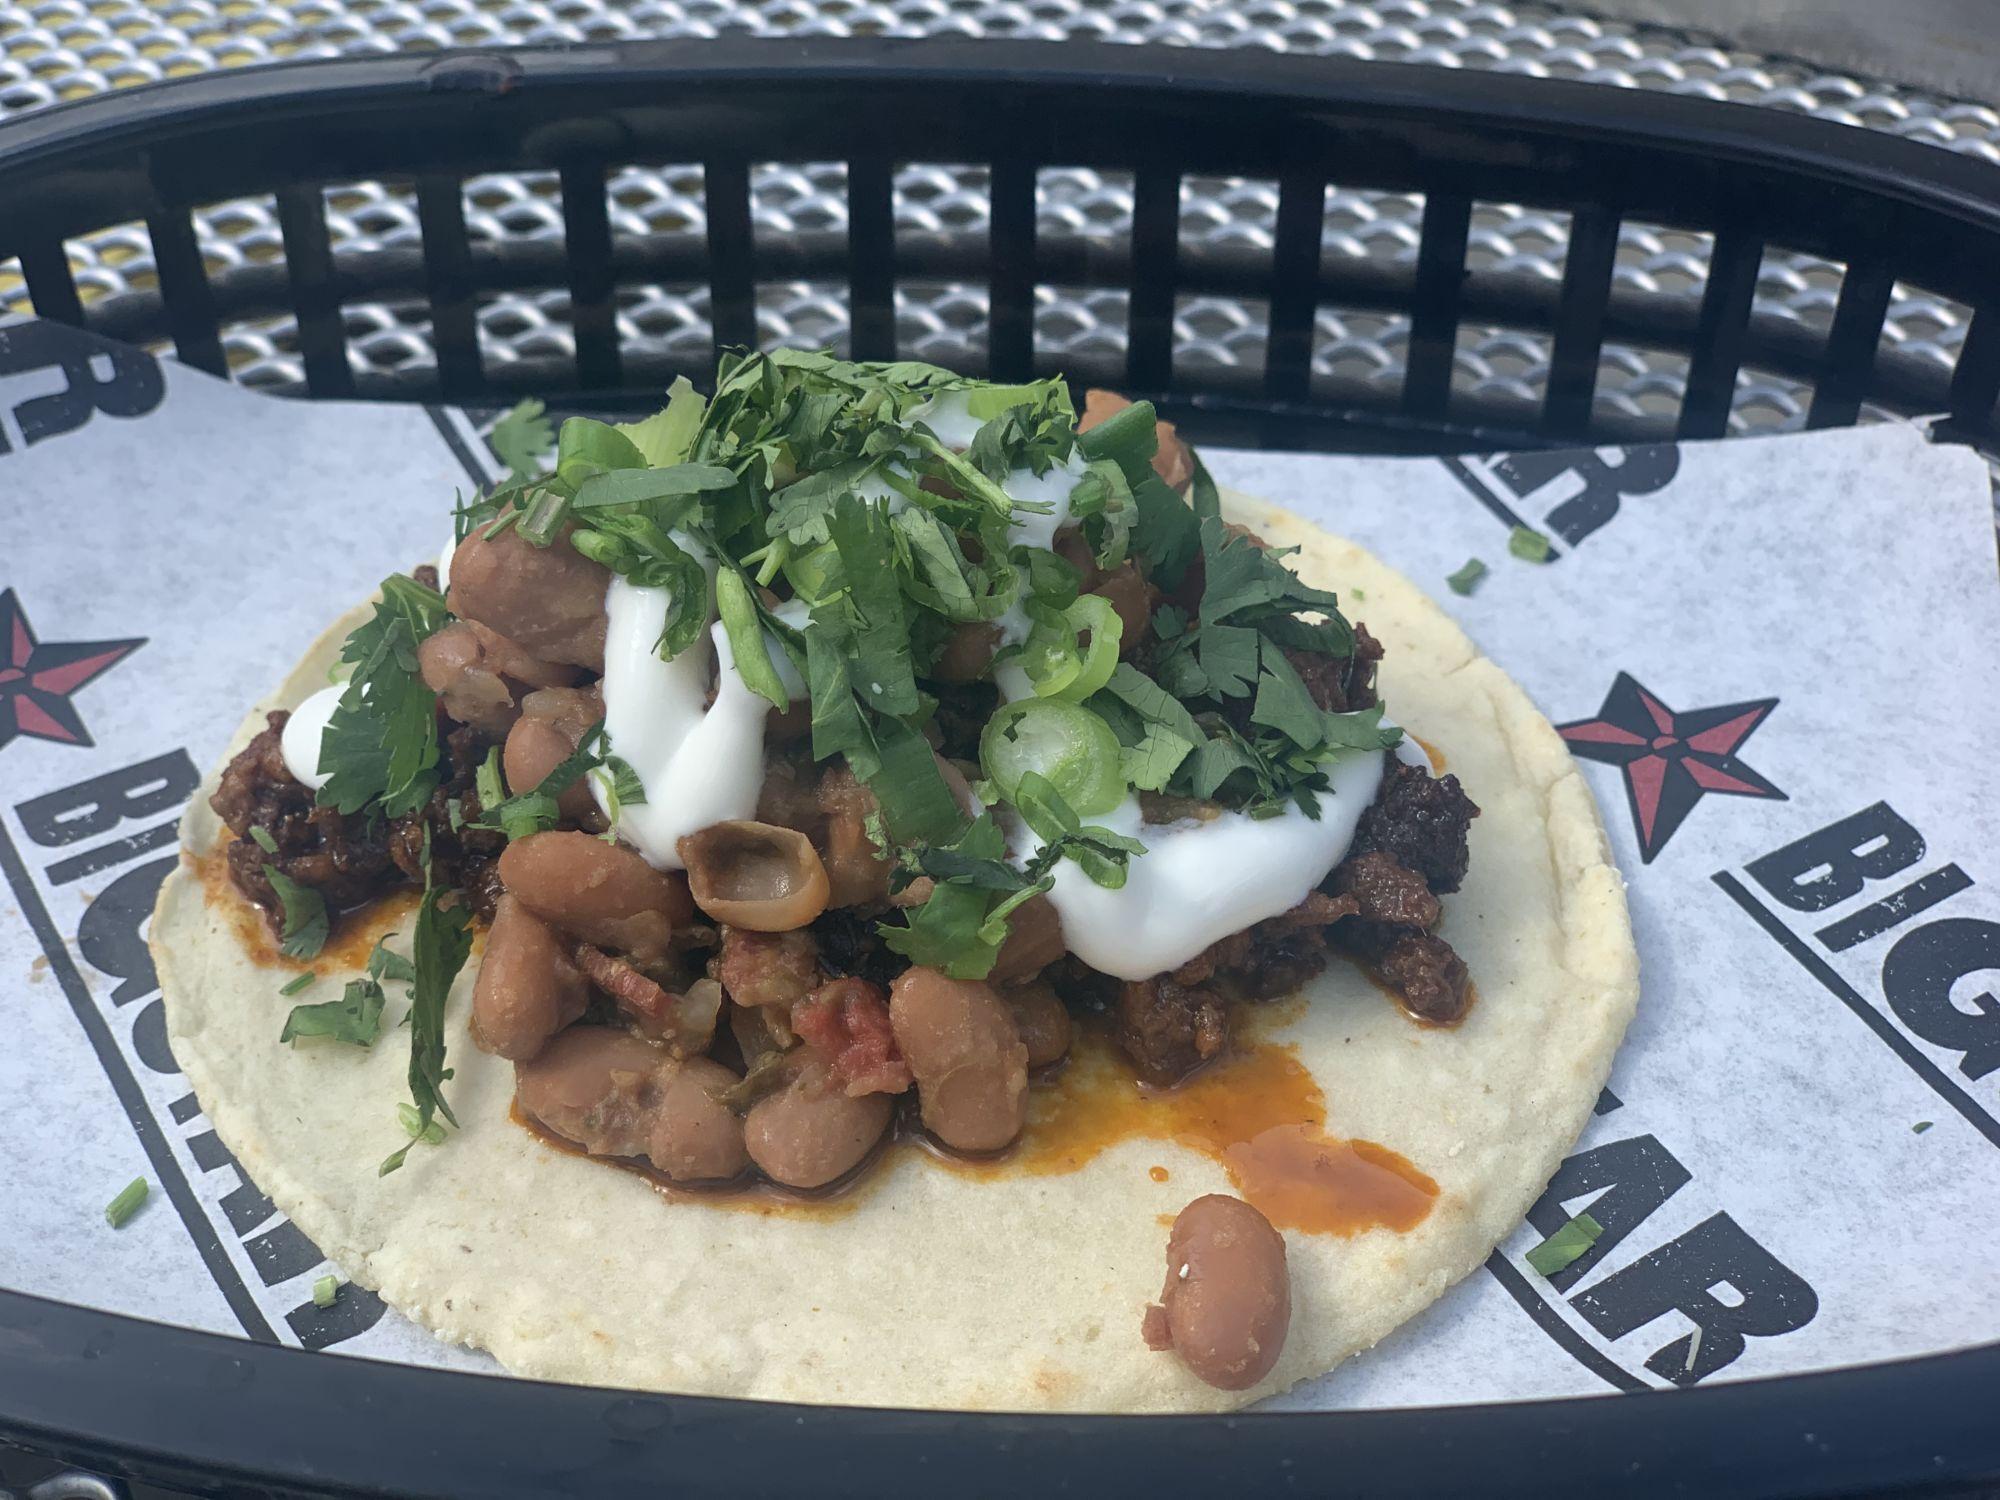 Chef Paul Kahan unveils MorningStar Farms Chorizo Taco to the delight of flexitarians